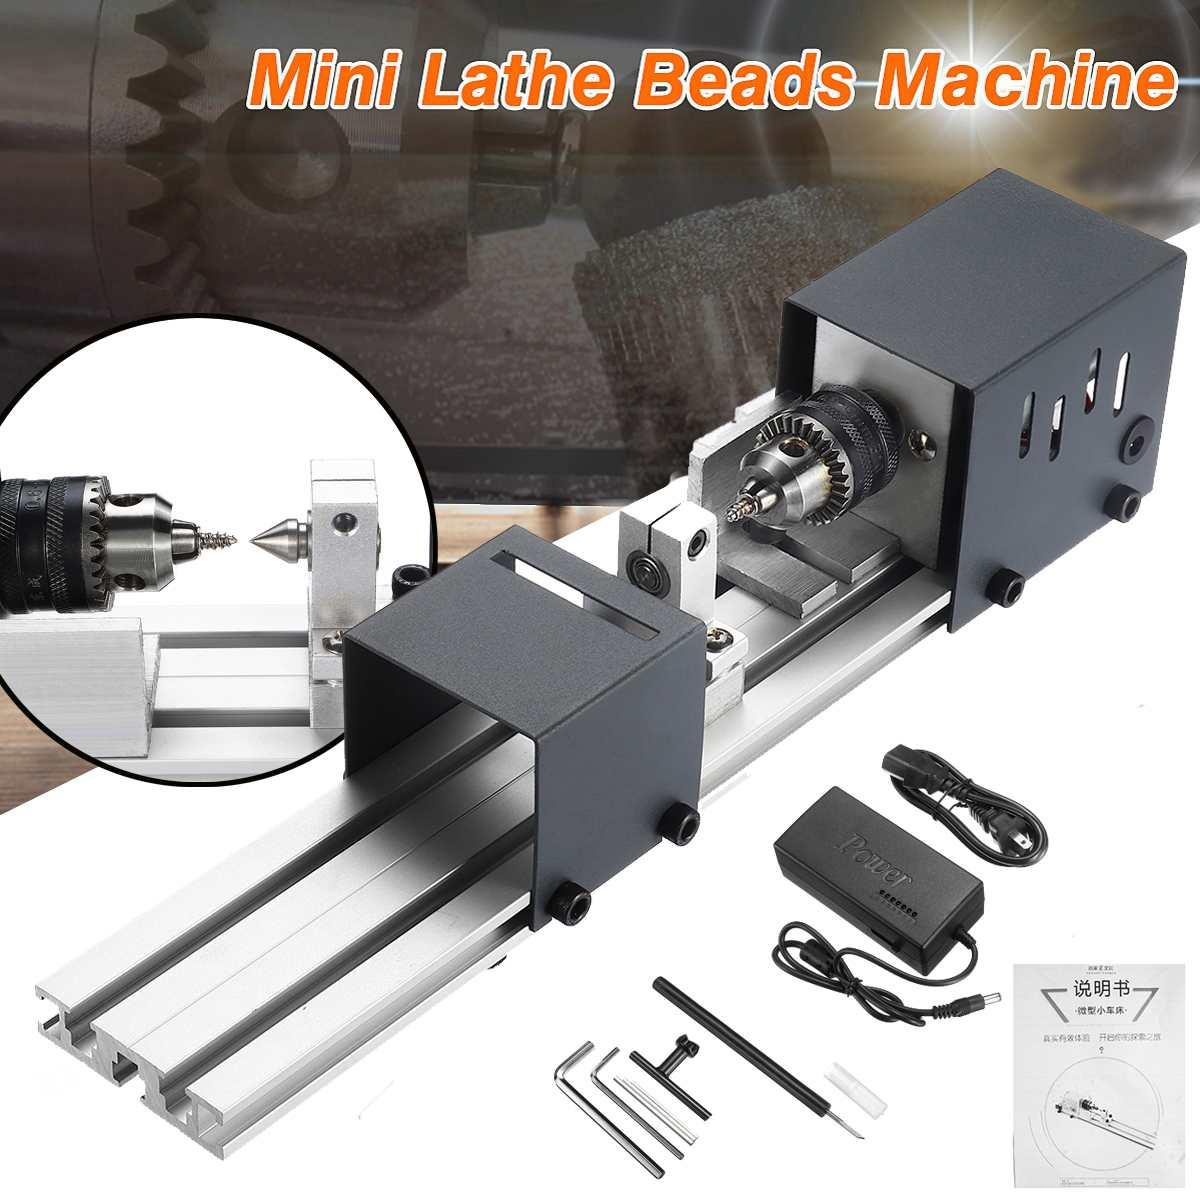 24V 80W Mini Lathe Beads Machine Polisher Table Woodworking DIY Rotary Tool Kit